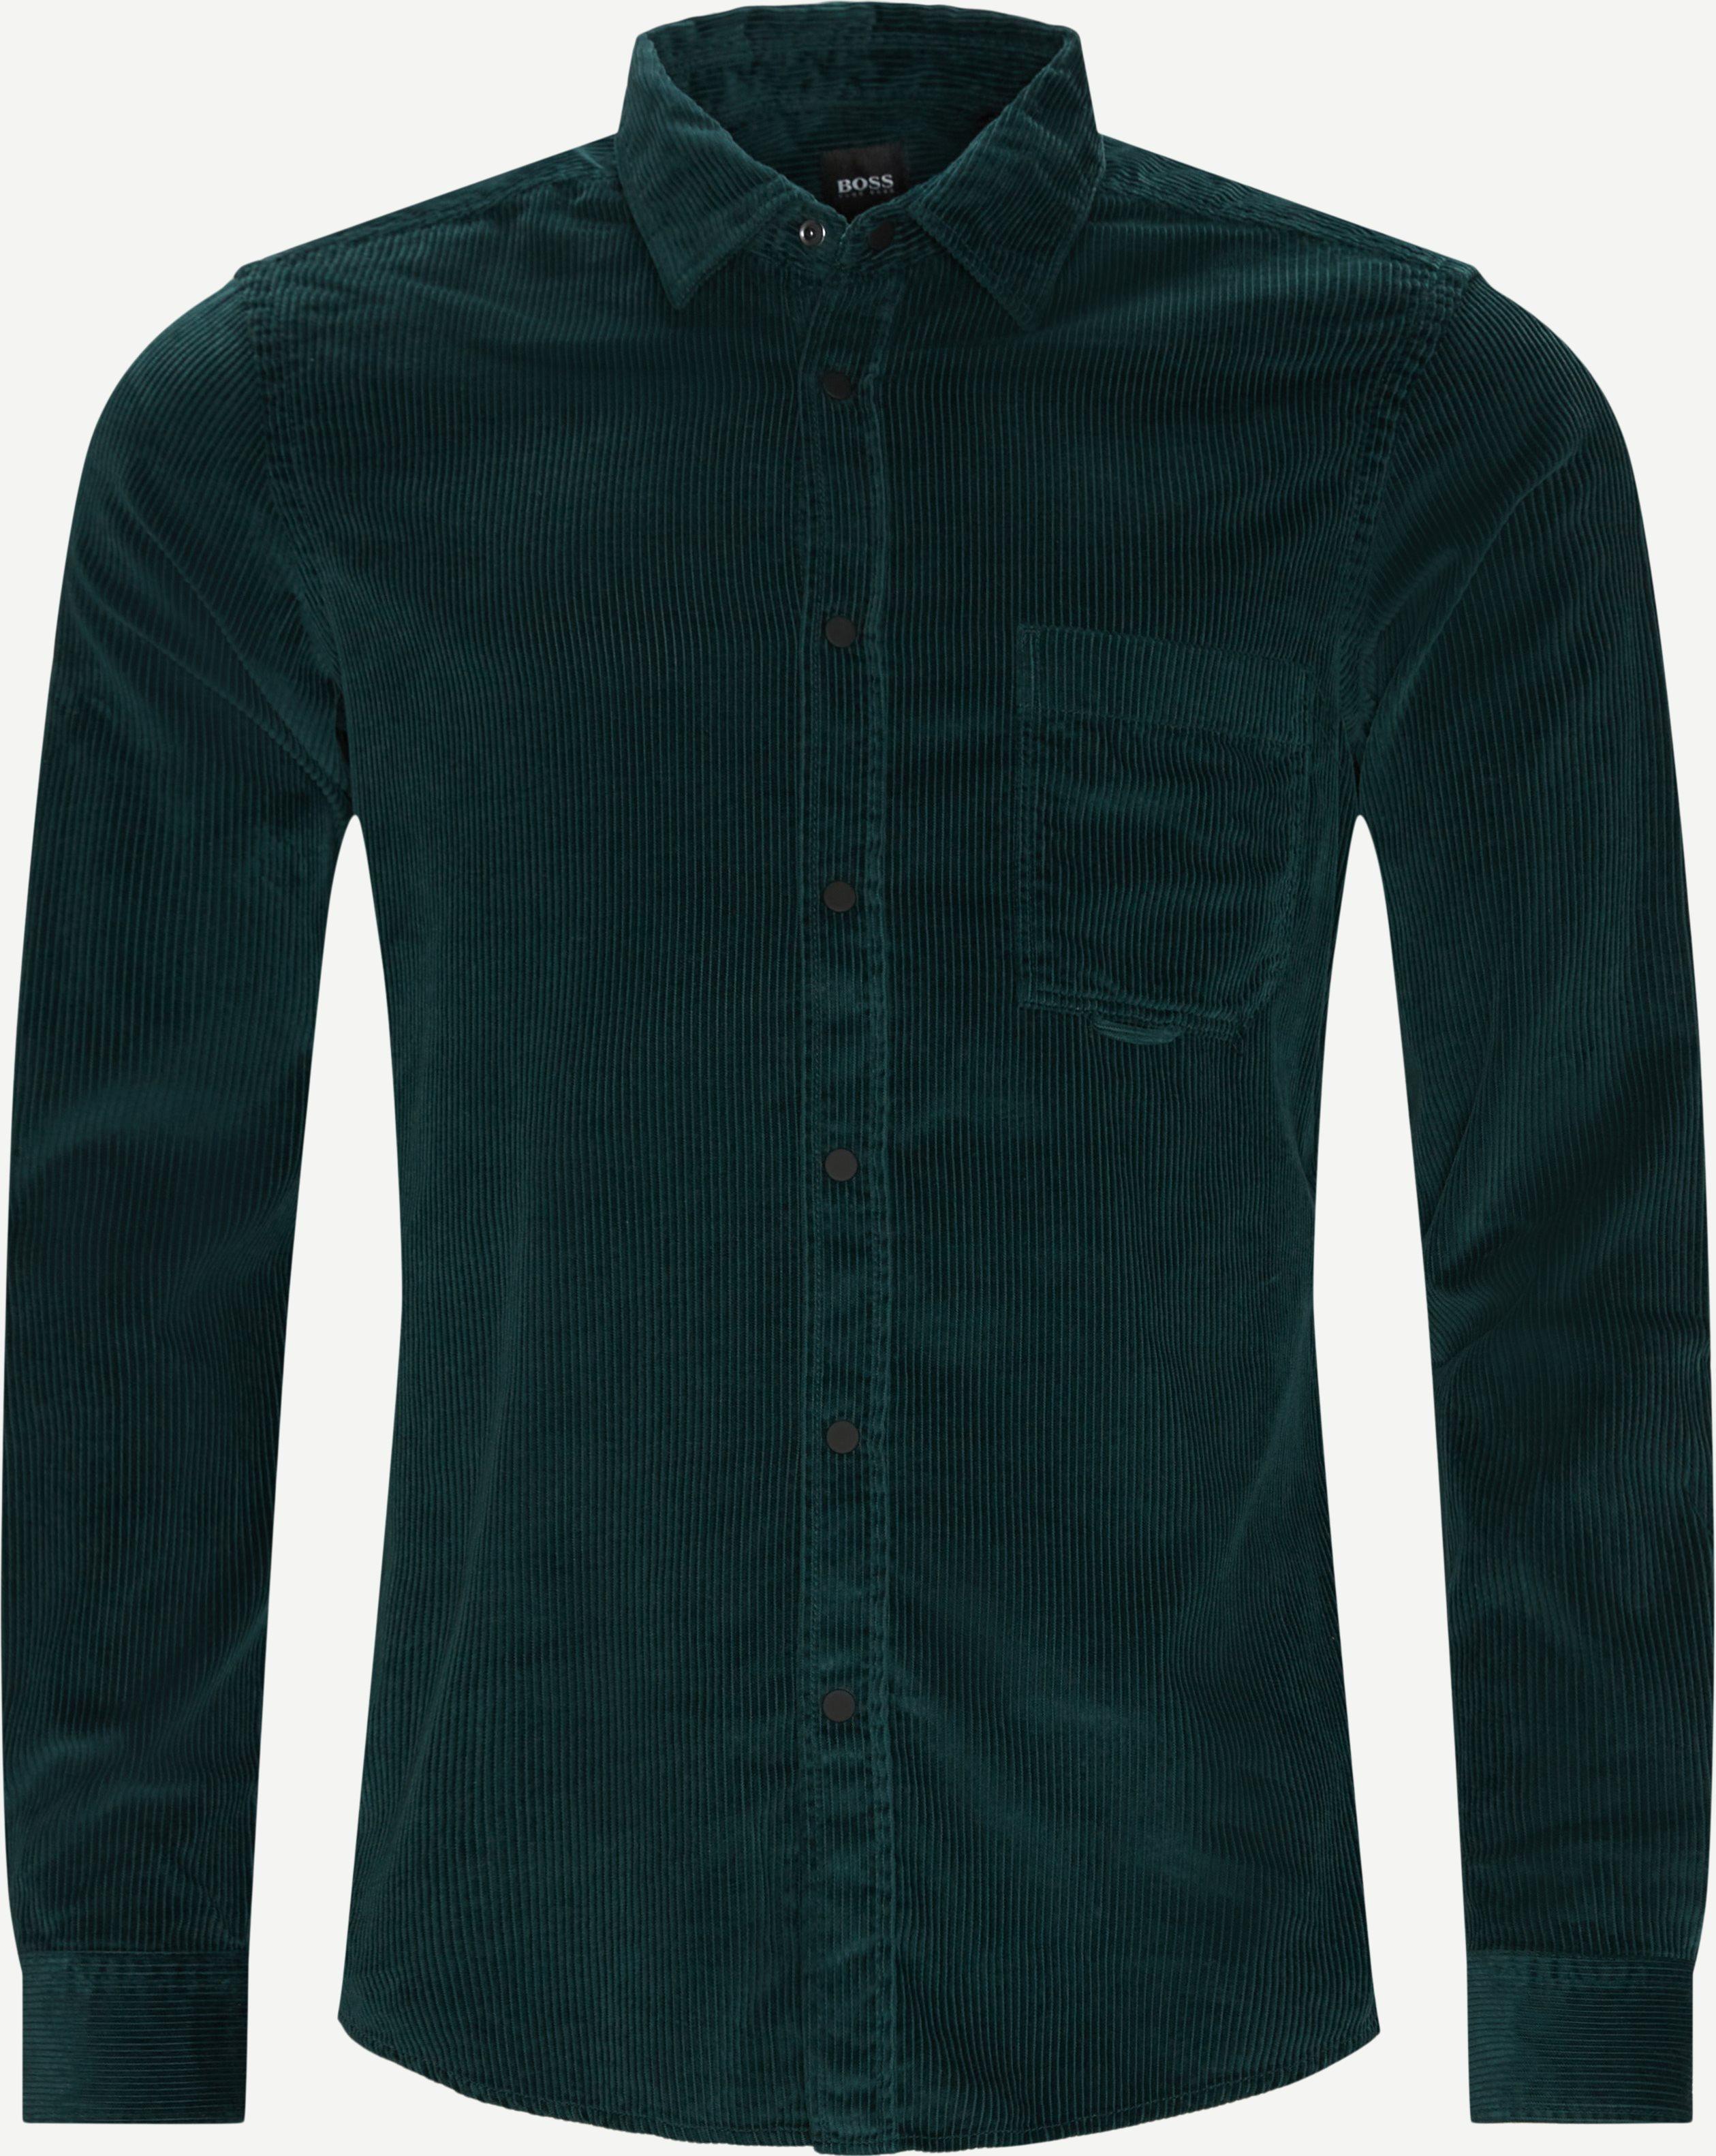 Riou Fløjelsskjorte - Skjorter - Regular fit - Grøn